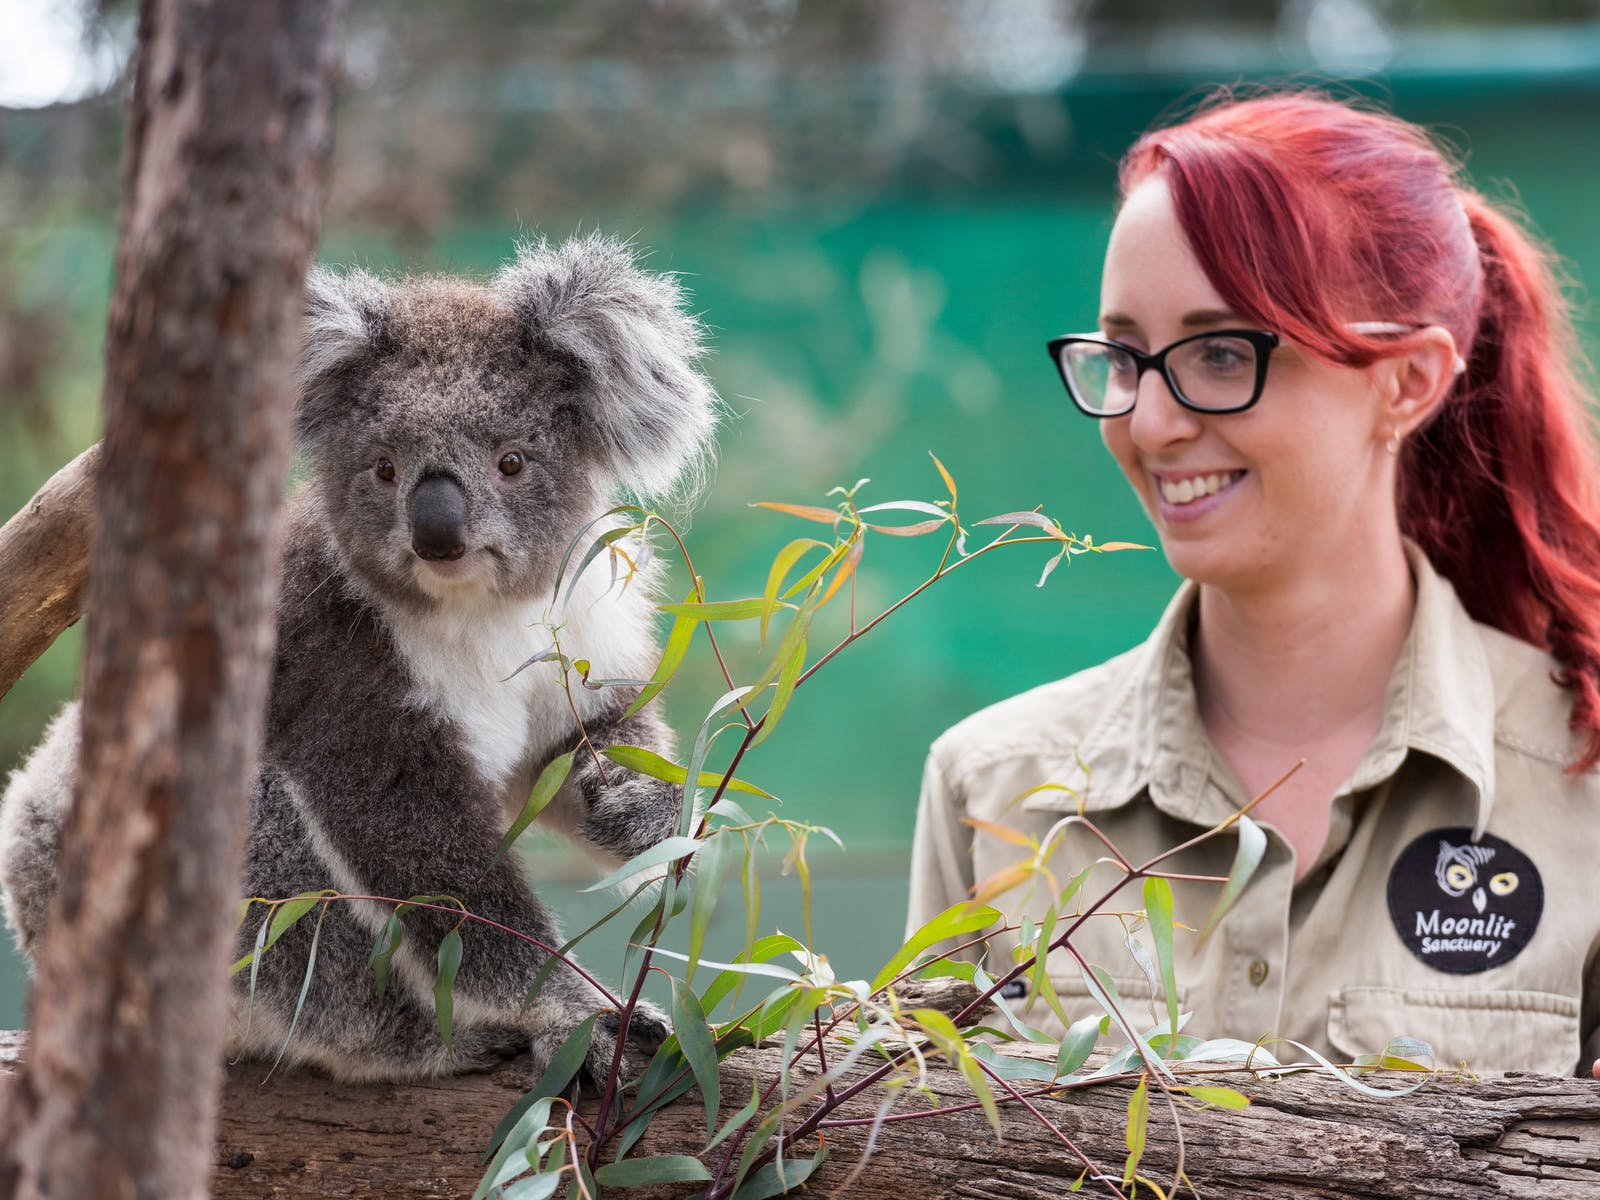 Koala Wildlife Mornington Peninsula Luxury Tour